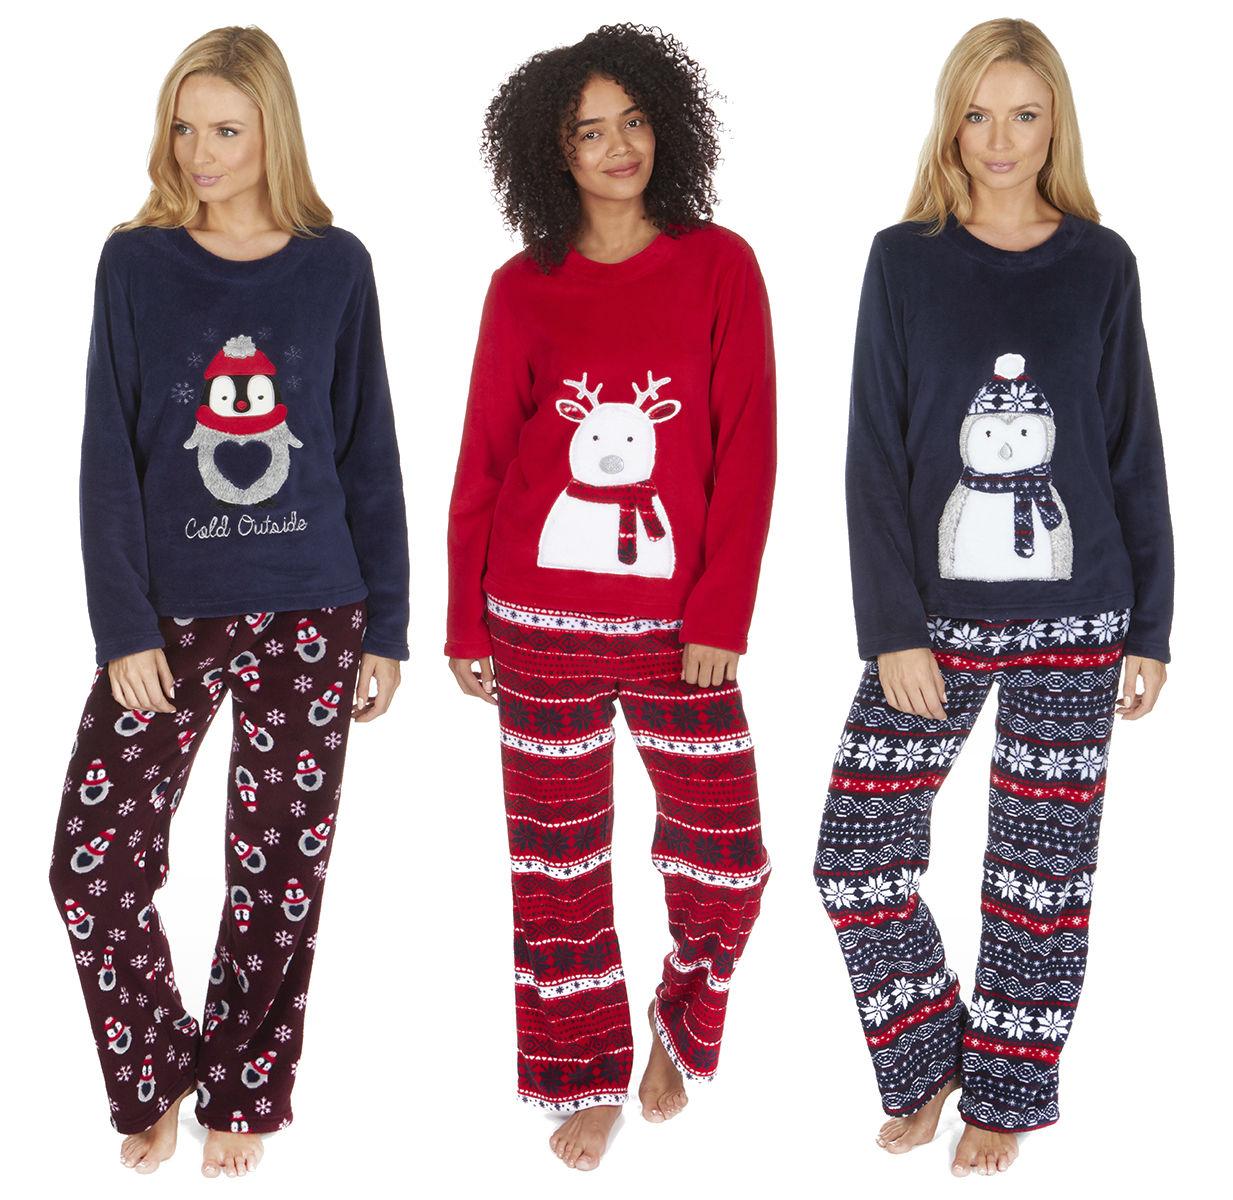 Christmas Pj.Details About Women S Coral Fleece Christmas Pj Pajama Set Nordic Fairisle Forever Dreaming